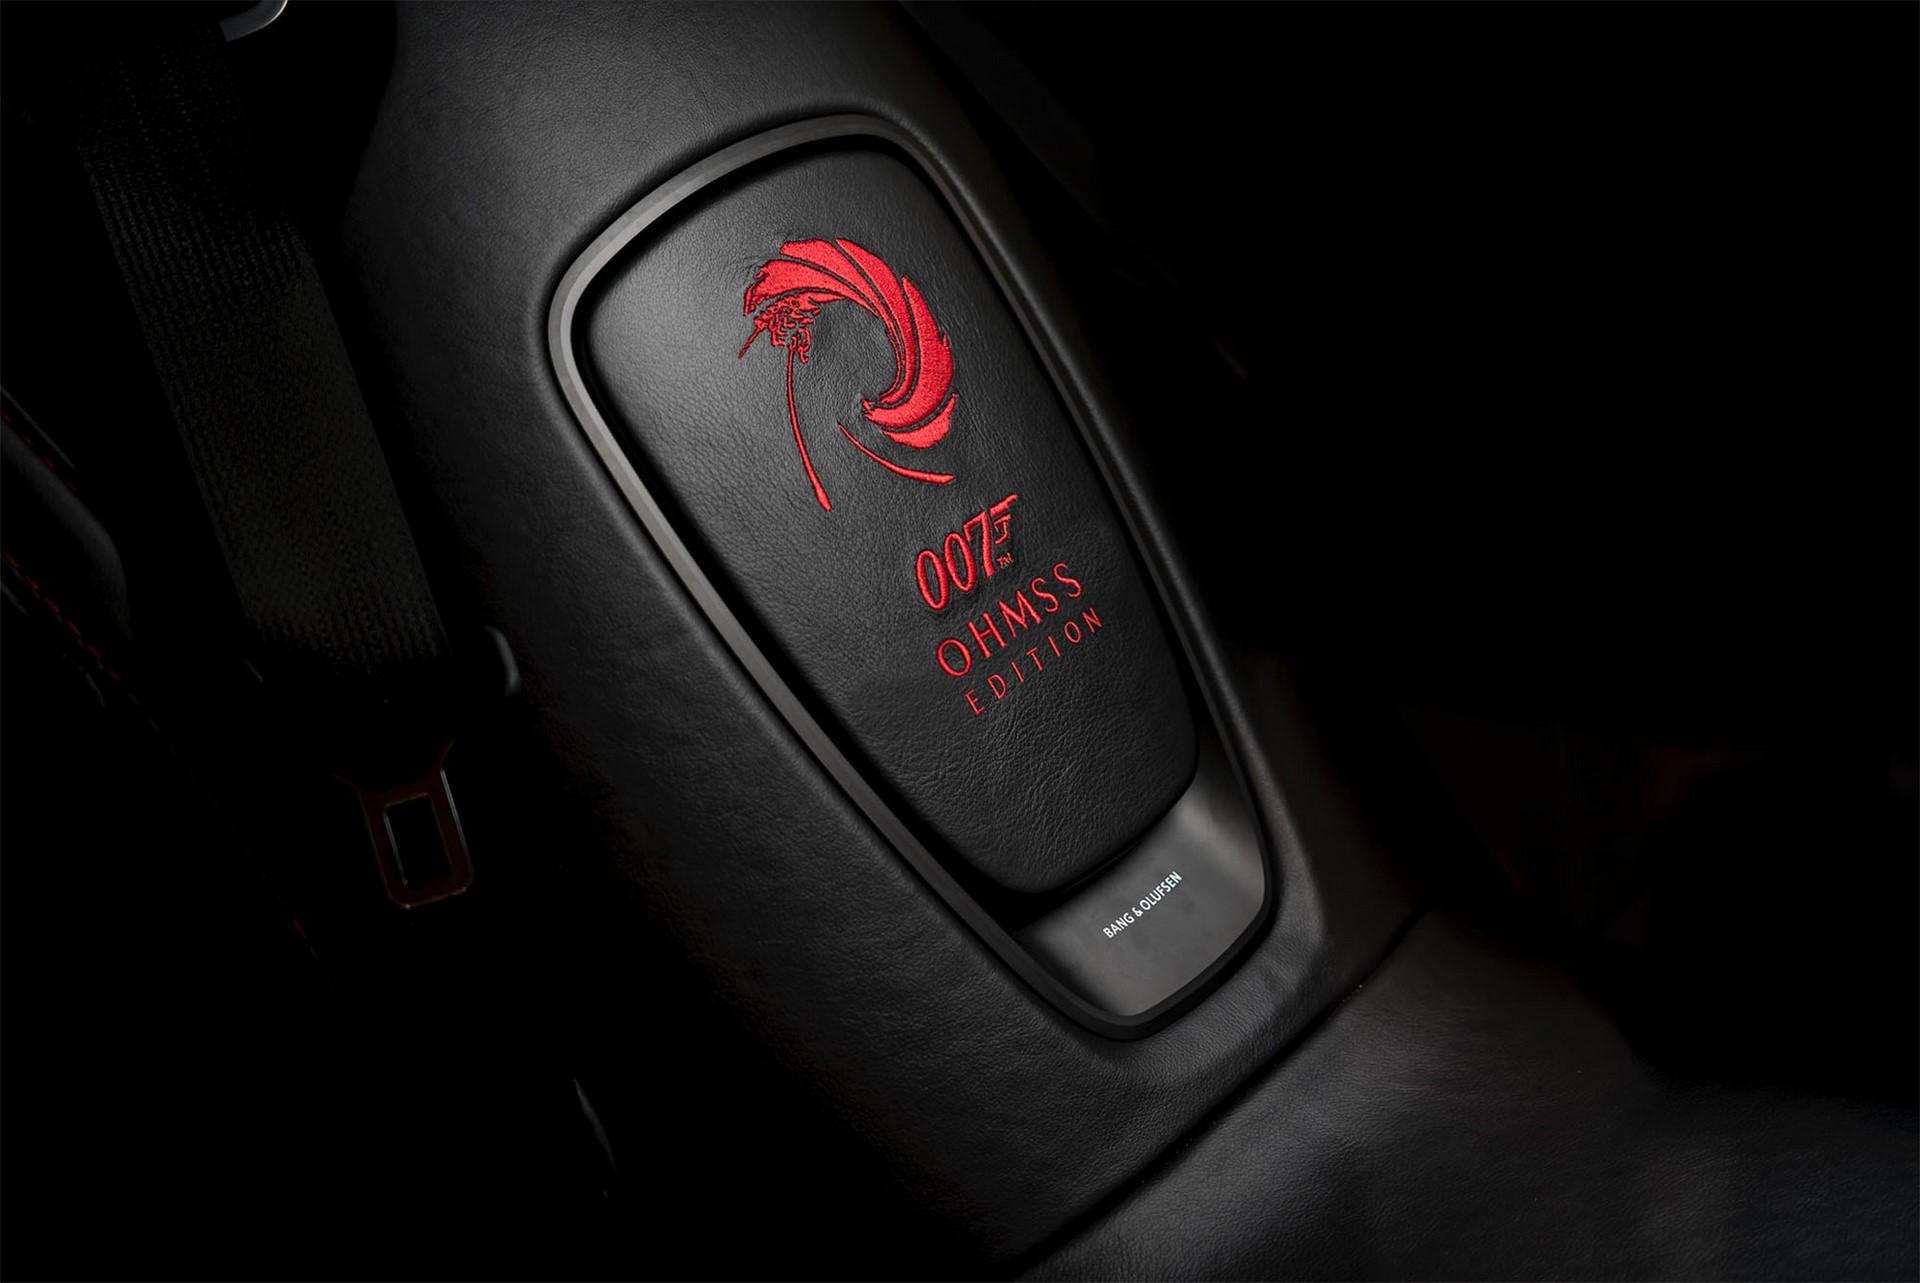 Aston-Martin-DBS-Superleggera-James-Bond-Special-Edition-13